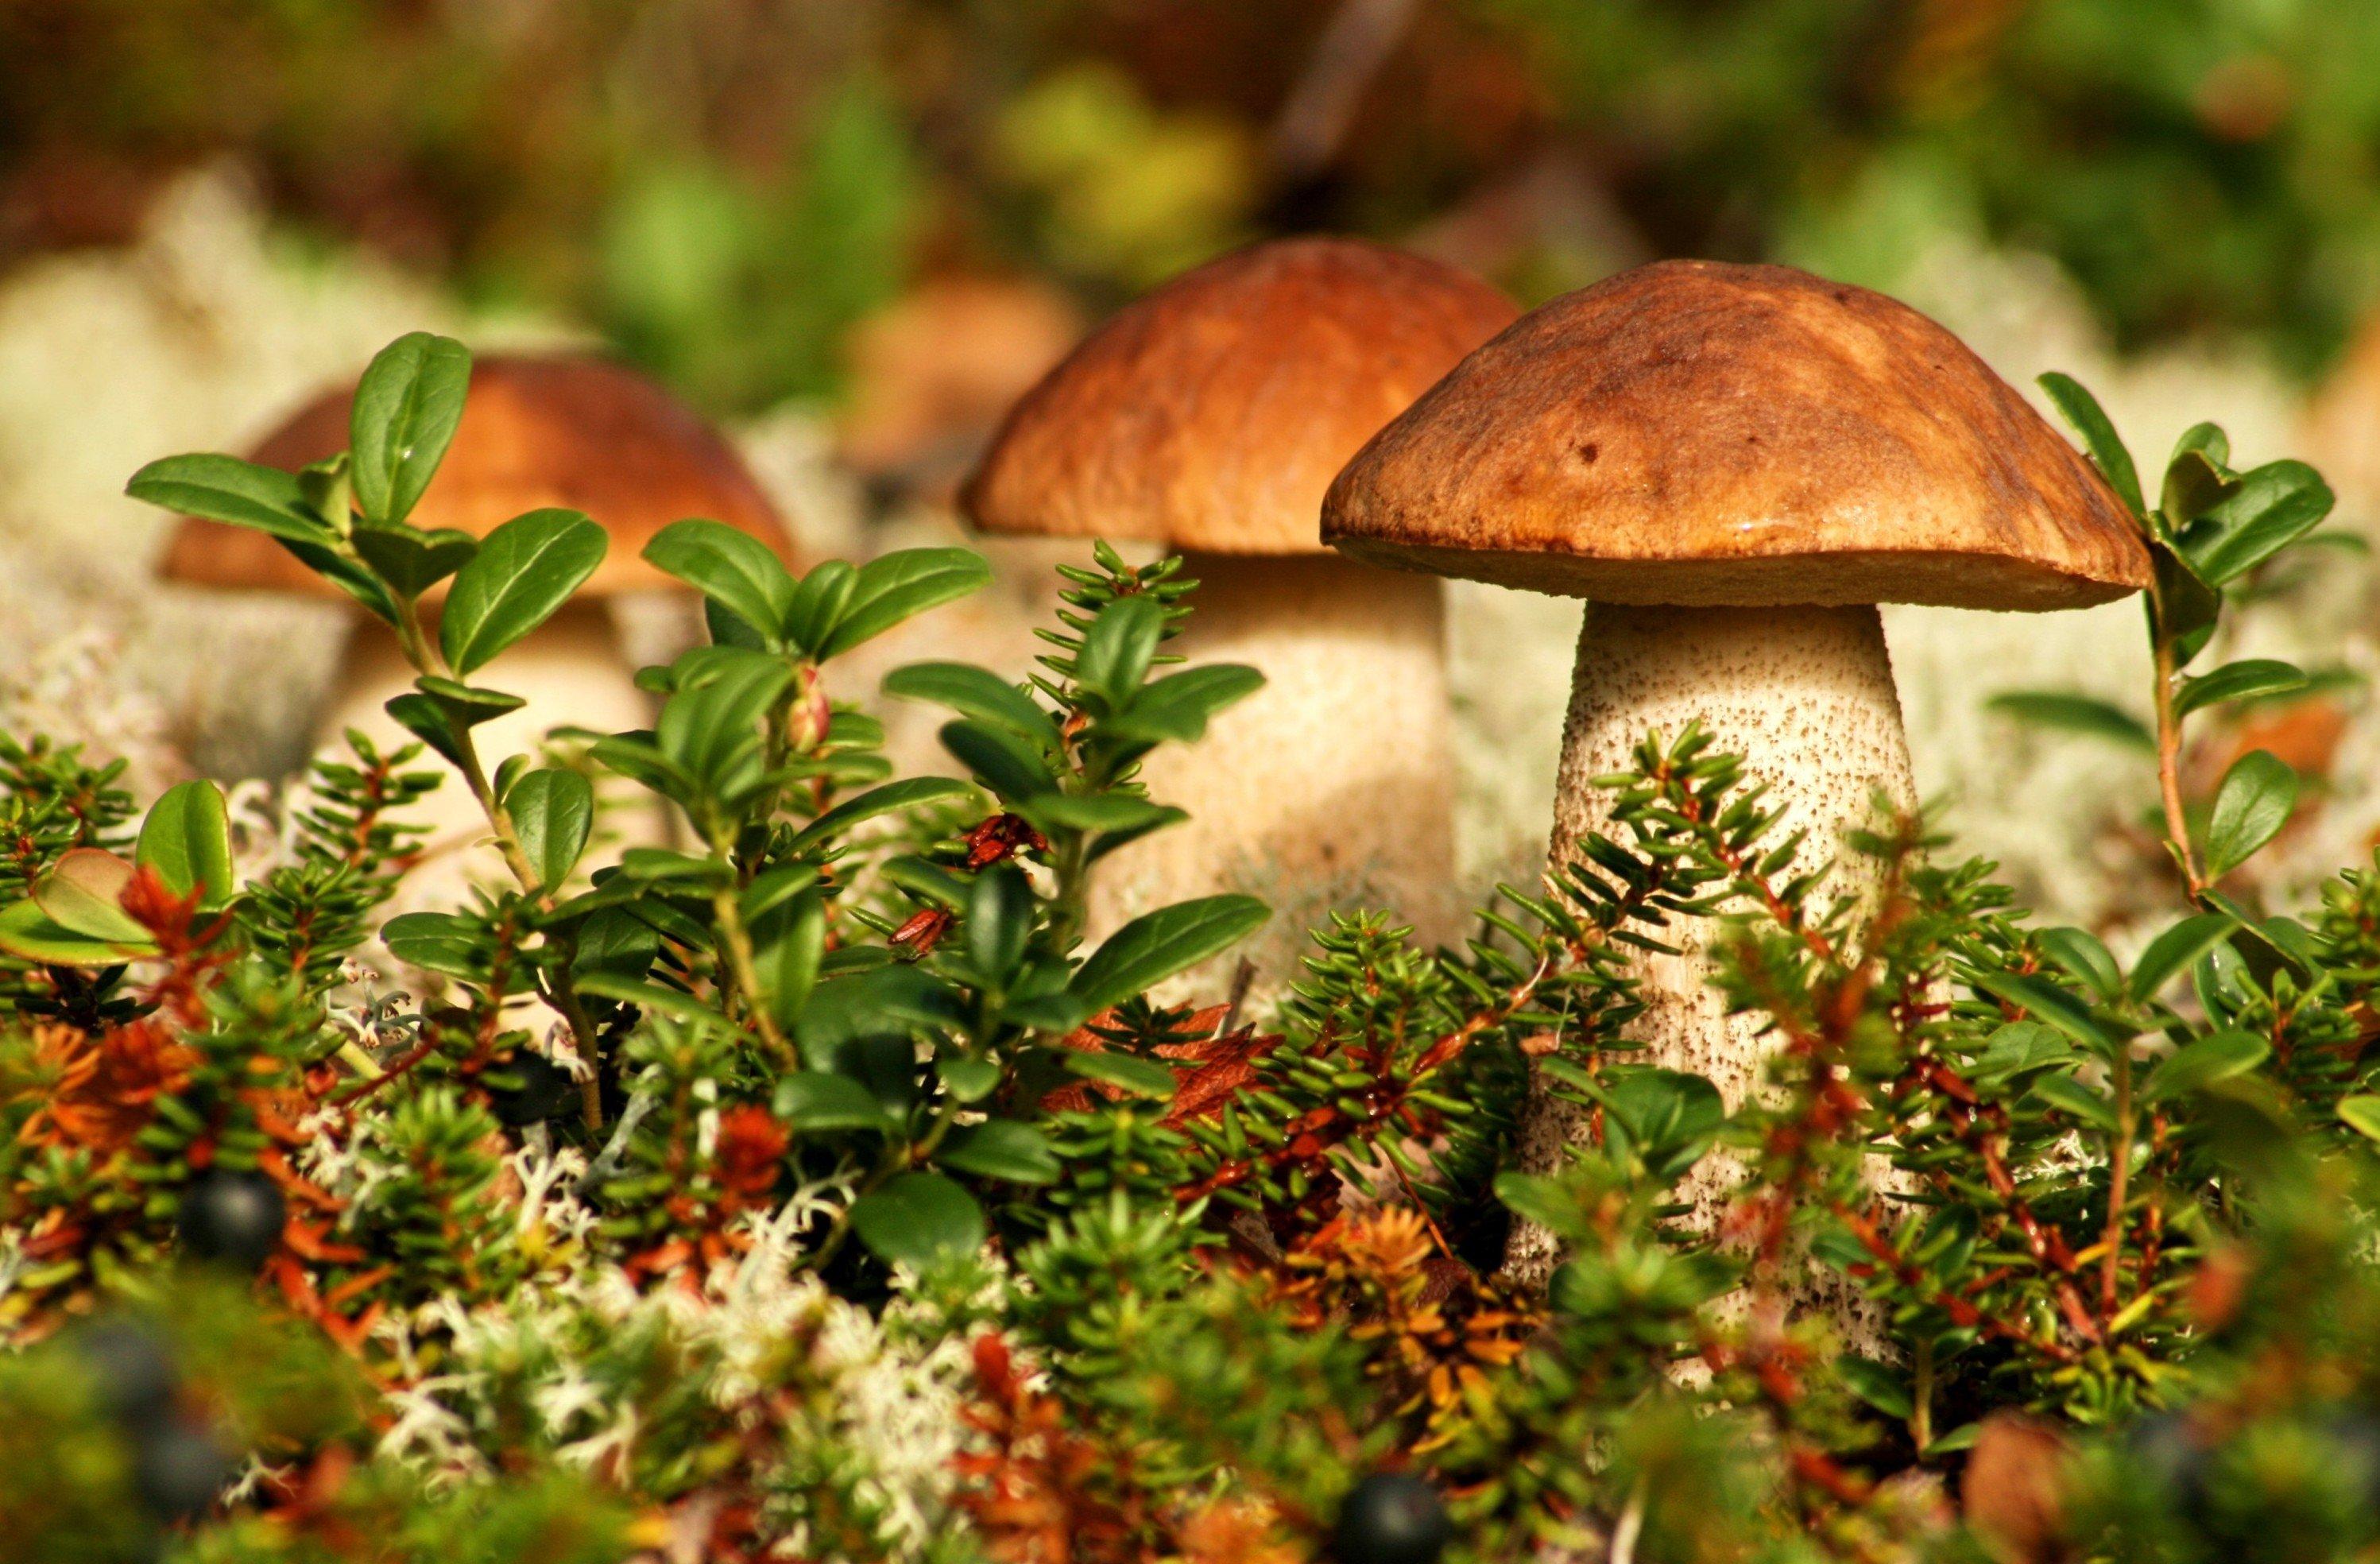 Секс под галлюциногенными грибами